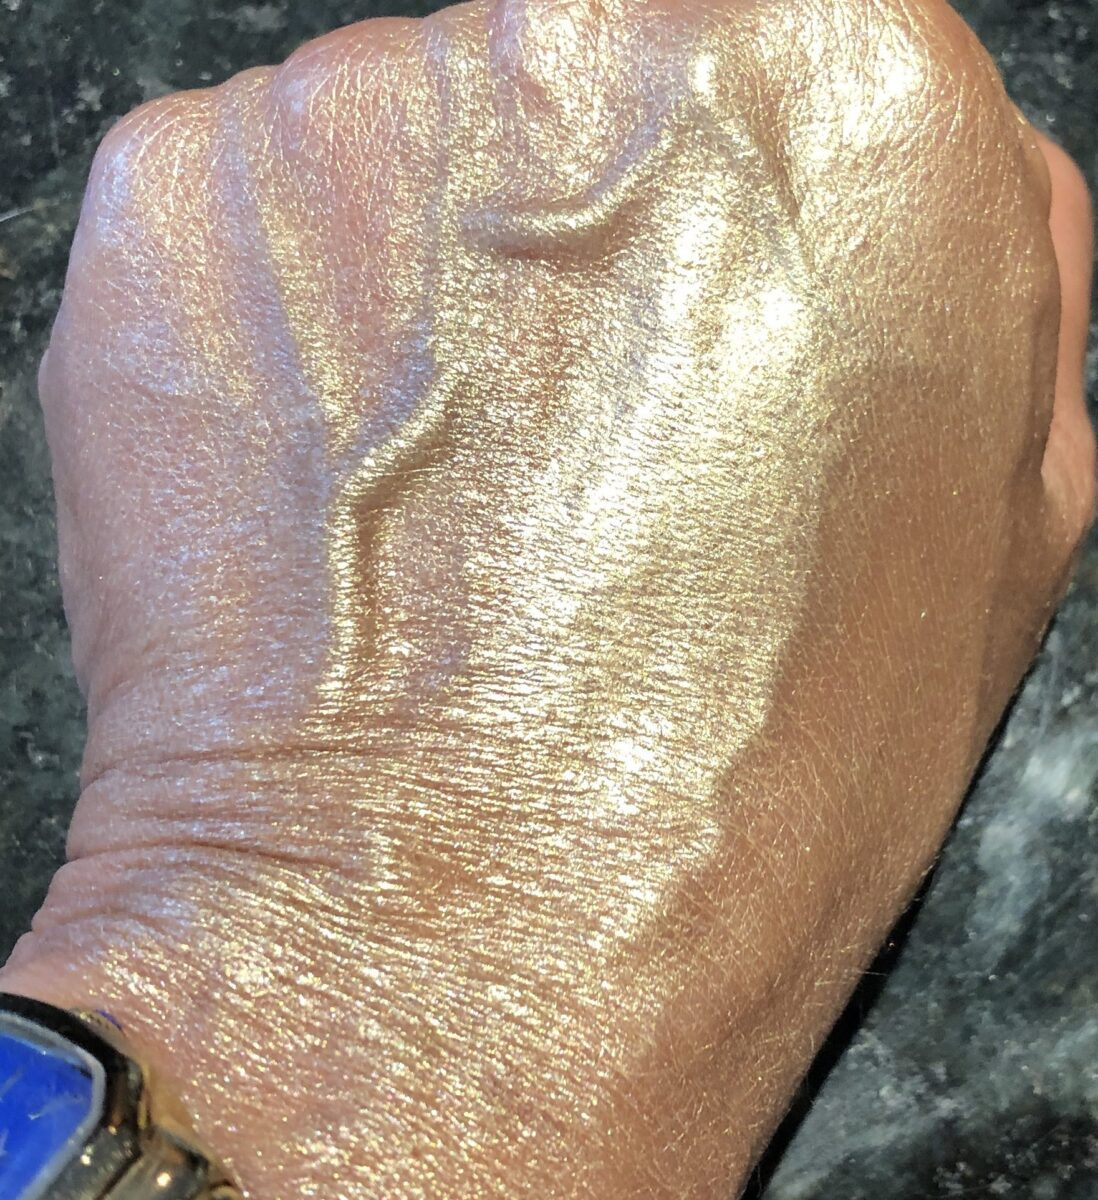 SUVA TRUST FUND LIQUID CHROME HIGHLIGHTER SWATCH ON HAND